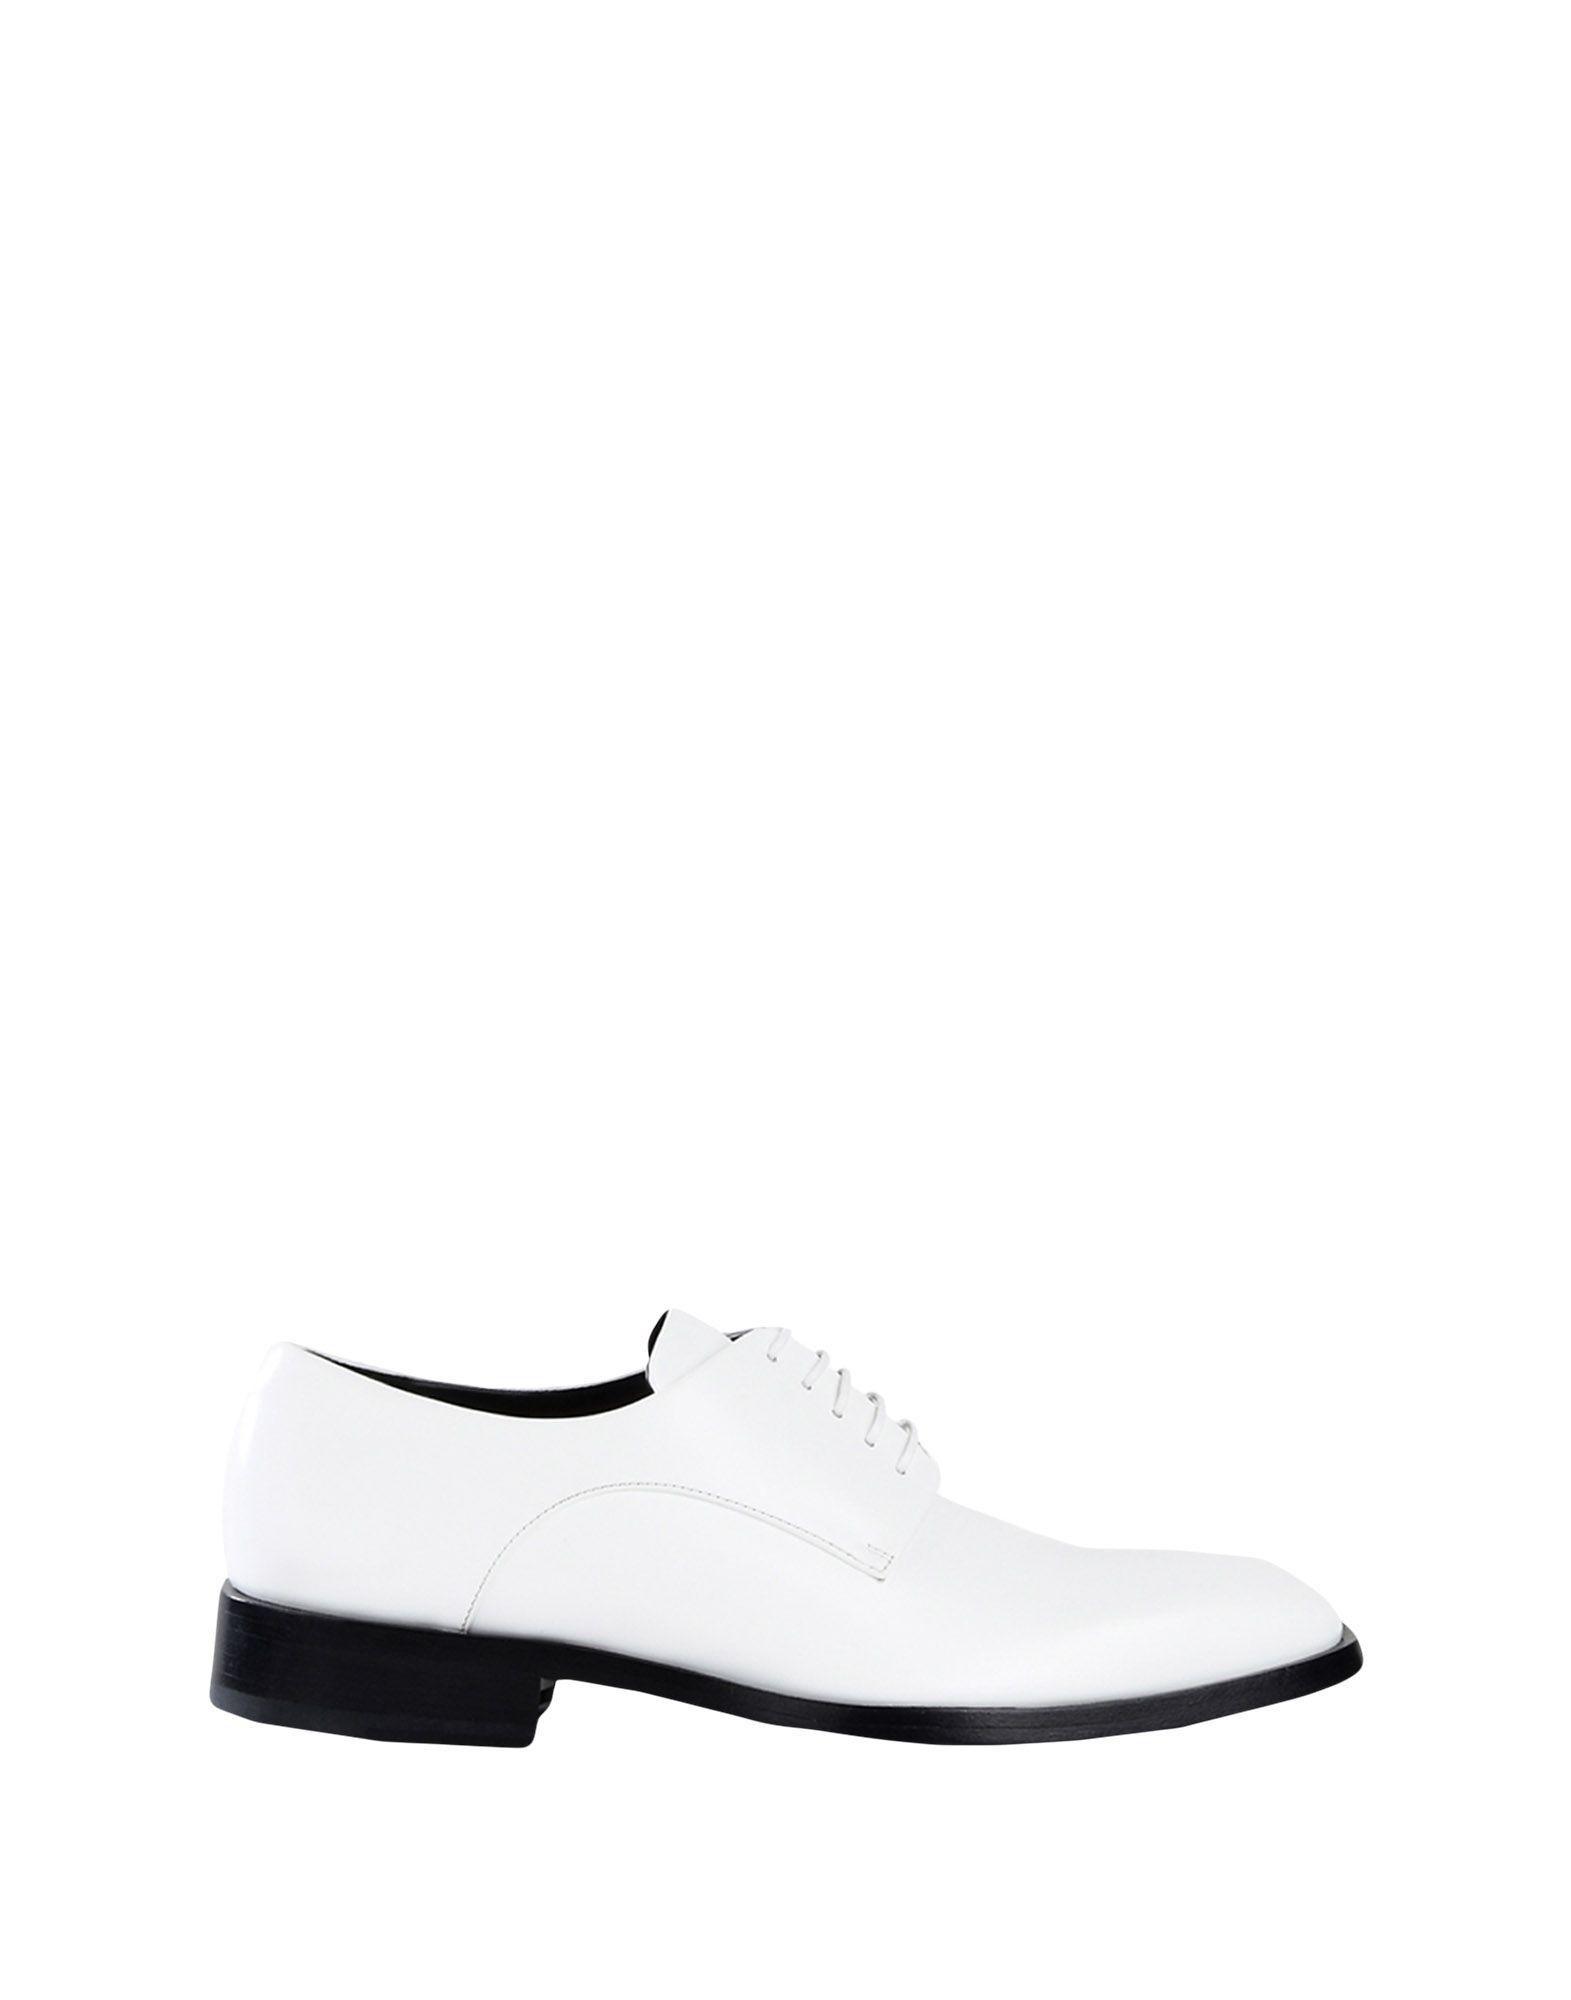 Jil Sander Schnürschuhe Damen  11518150PXGünstige gut aussehende Schuhe